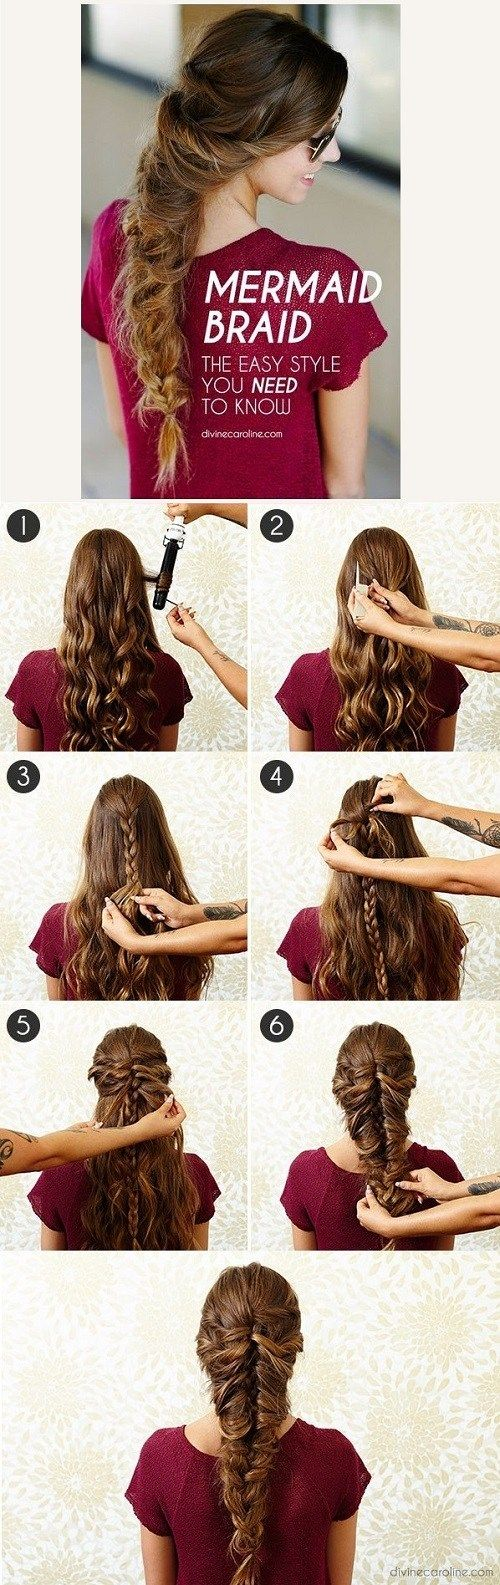 hair tutorials you can totally diy mermaid braid mermaid and